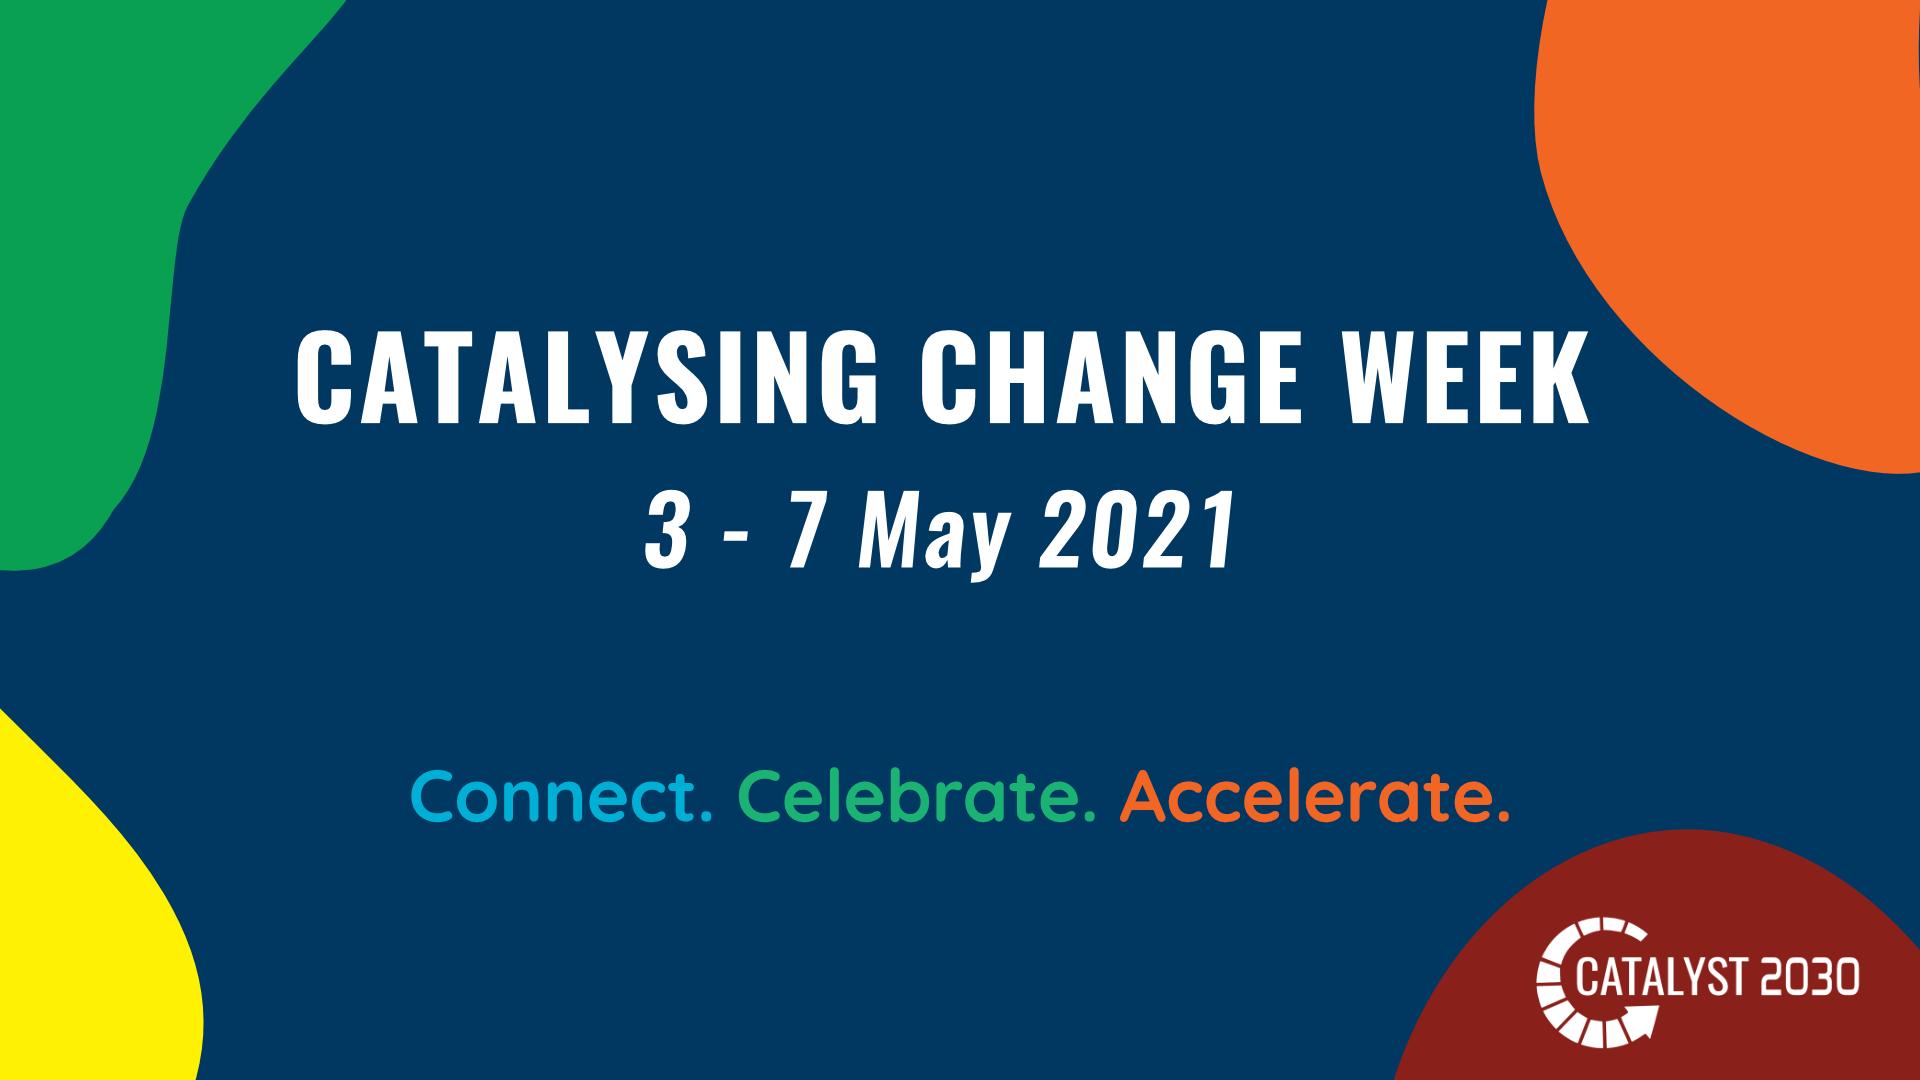 Catalyzing Change Week